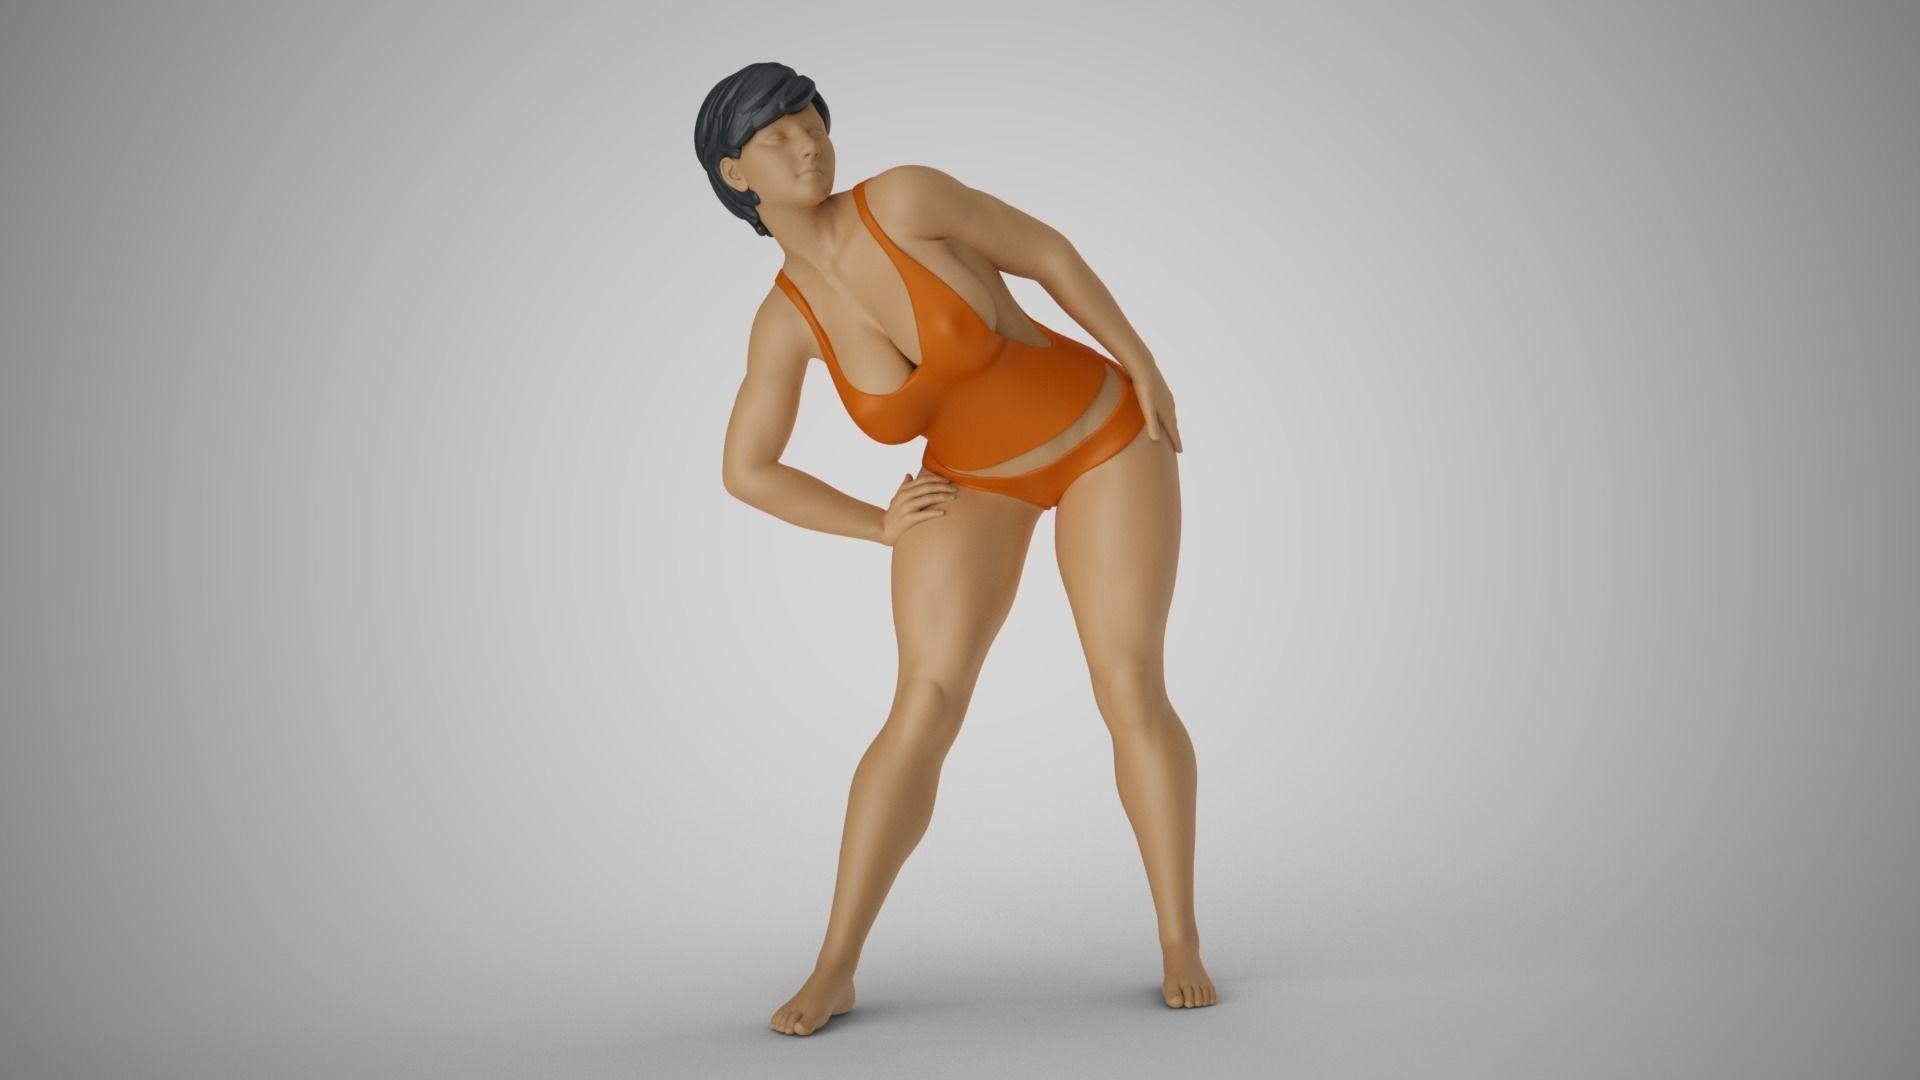 Woman Bending to Look